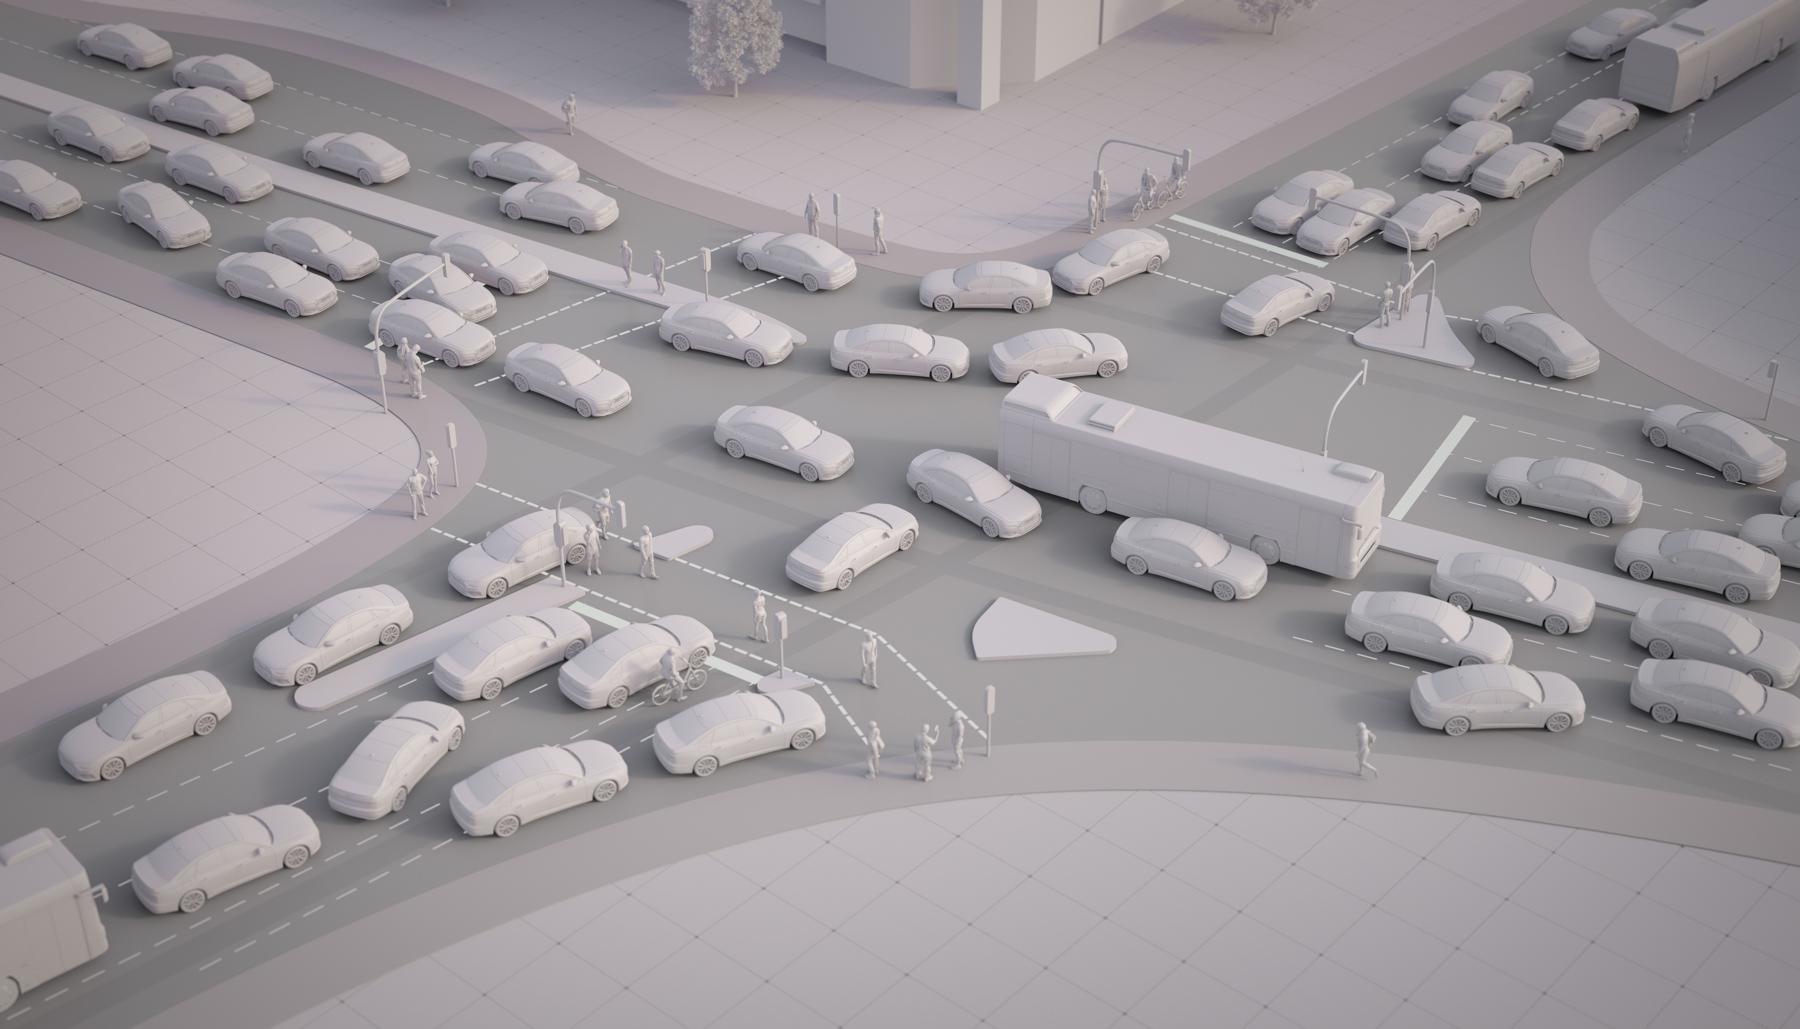 Audi: Autonomous cars alone won't solve traffic jams